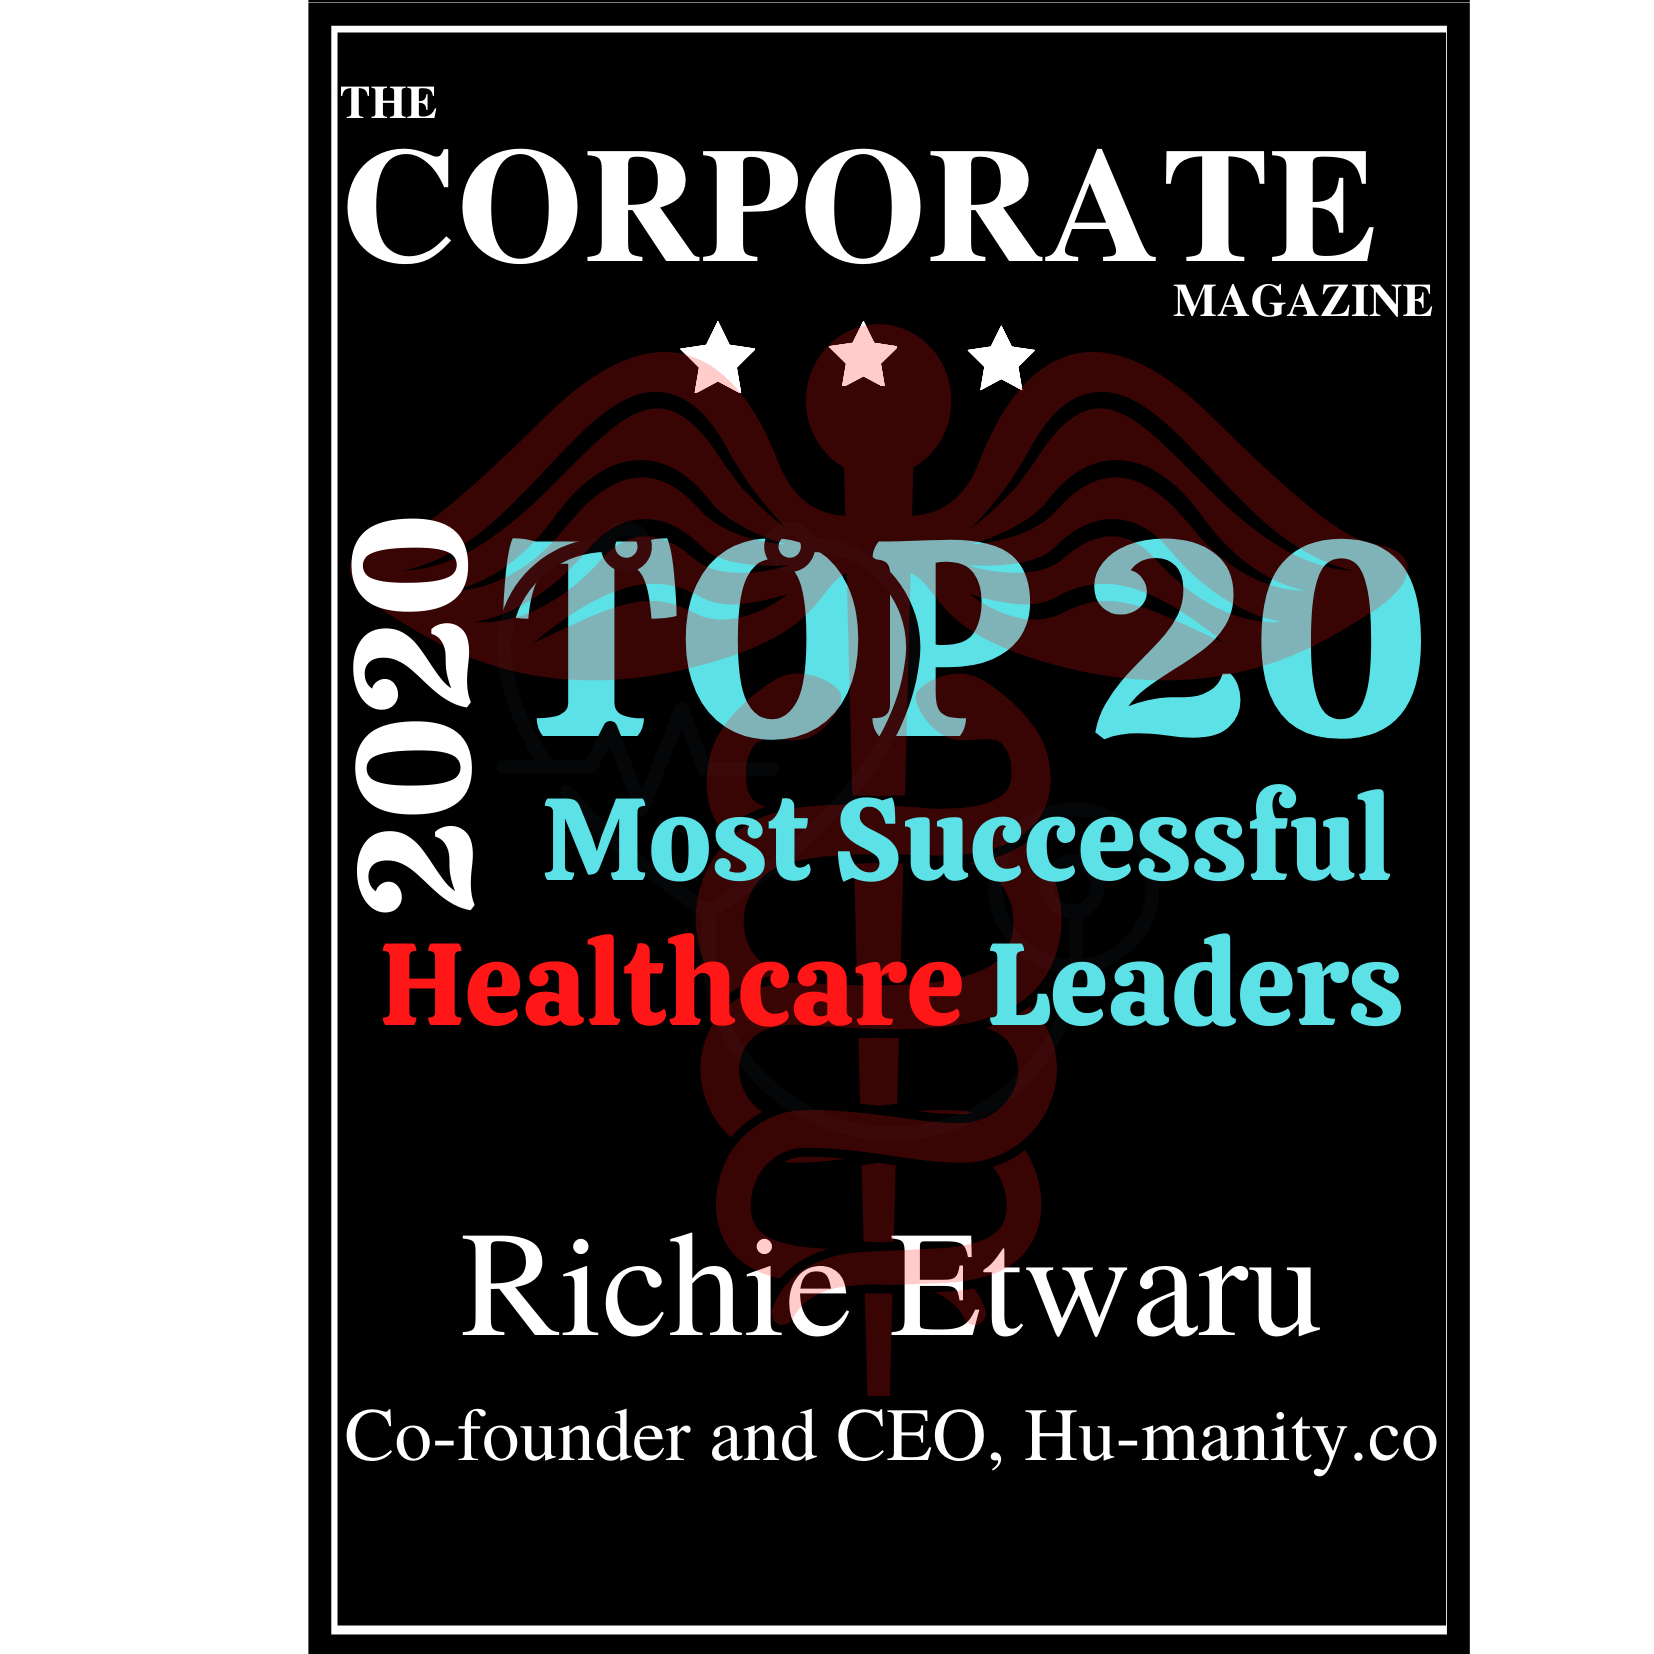 Richie Etwaru Top Healthcare leaders